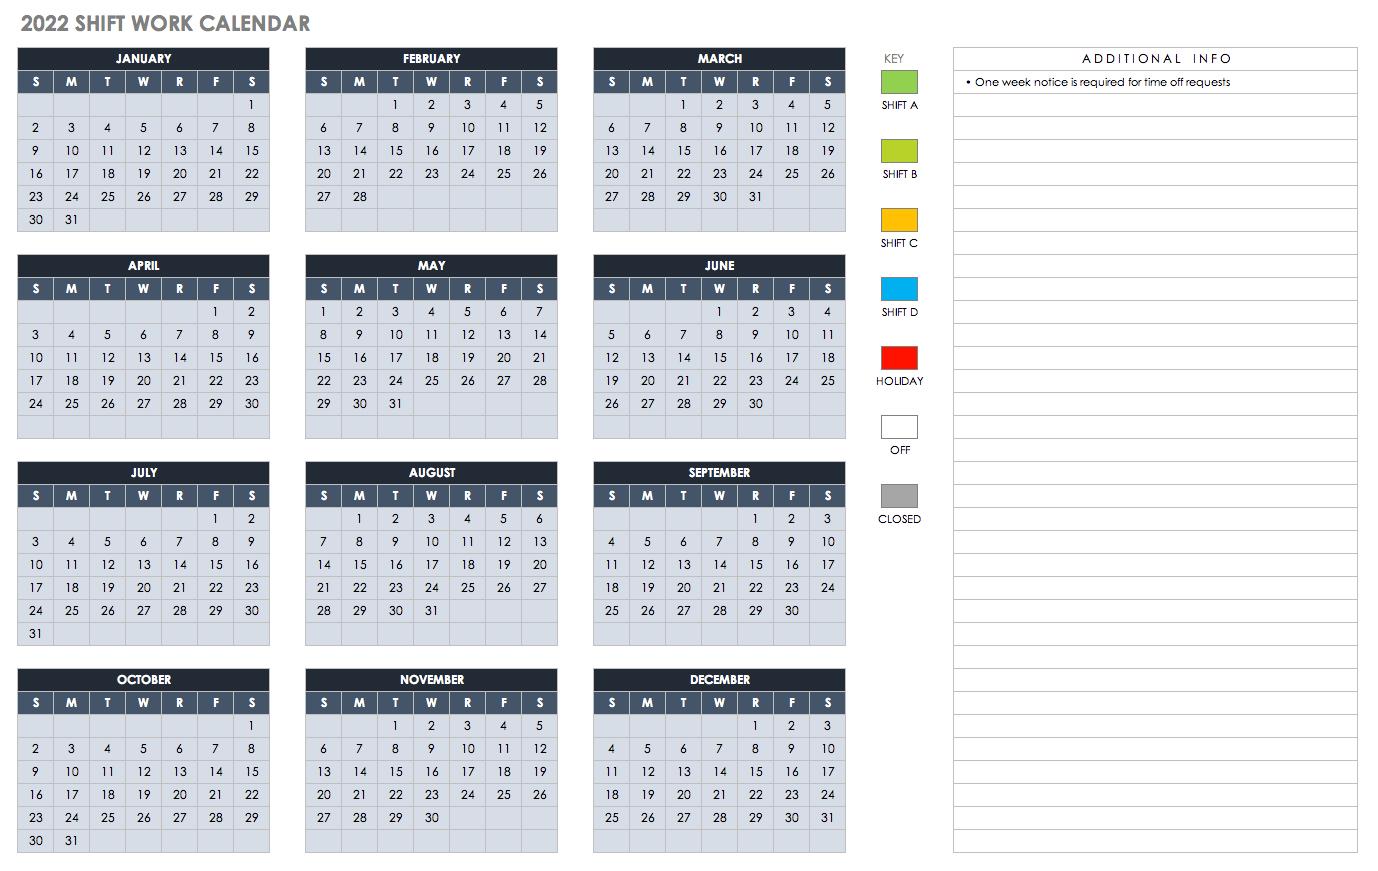 15 Free Monthly Calendar Templates | Smartsheet intended for 2021 Shift Calendar Free